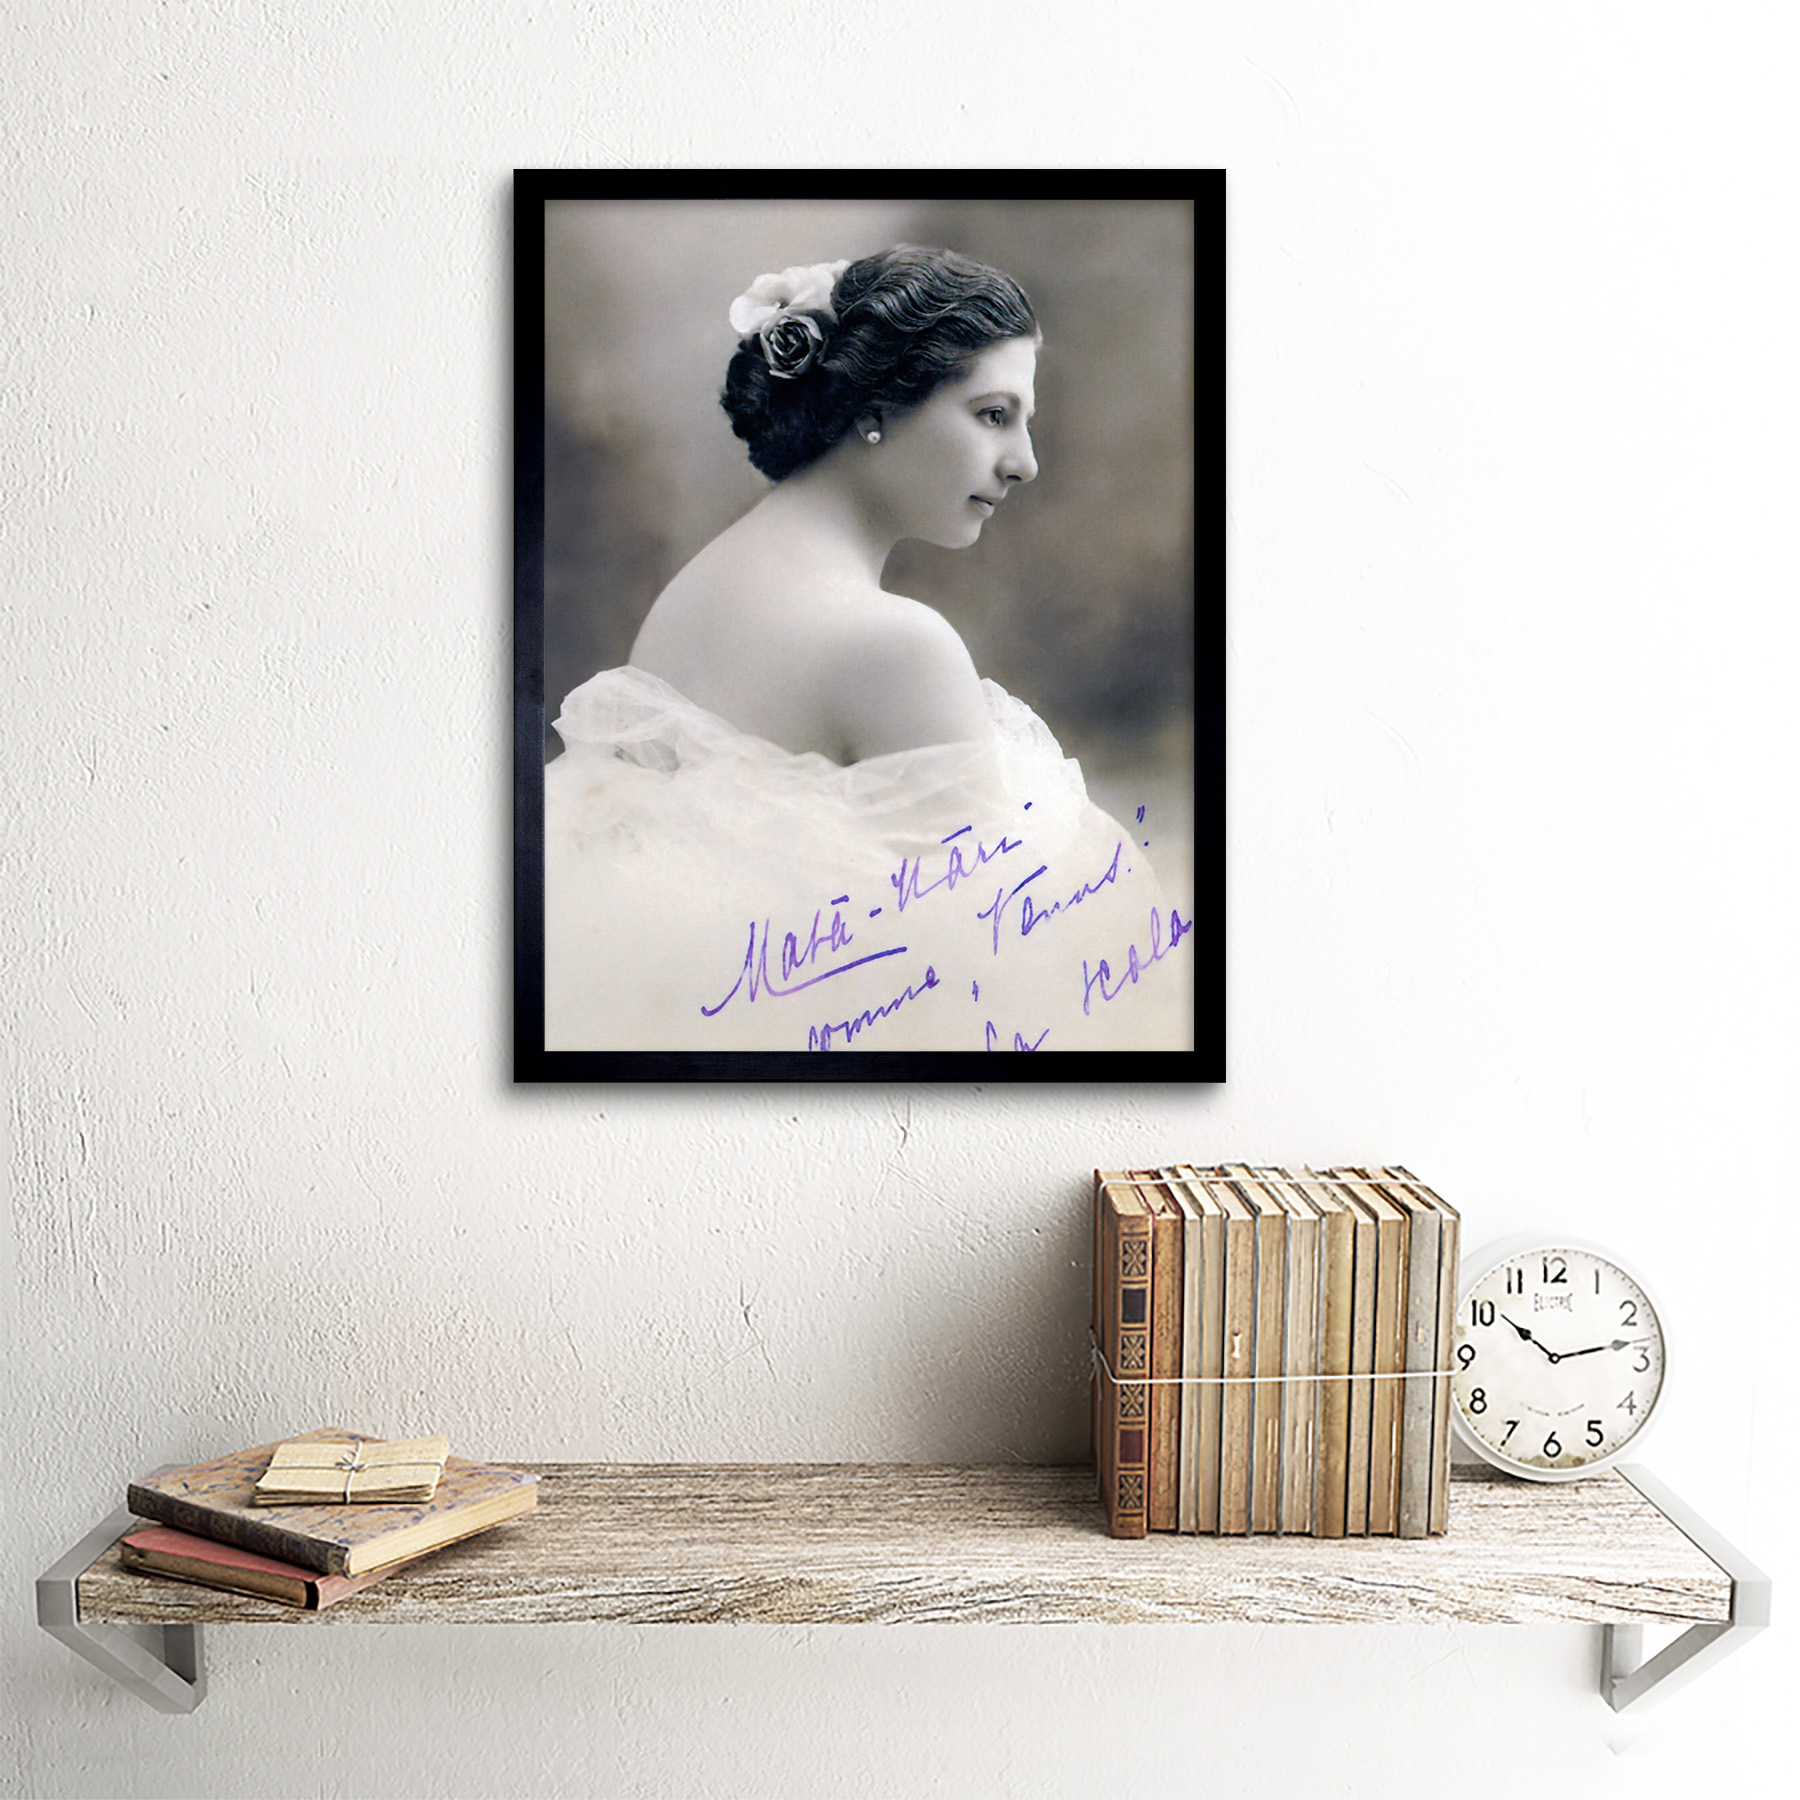 Autographed-Portrait-Dancer-Spy-Mata-Hari-Photo-Framed-Wall-Art-Poster thumbnail 3